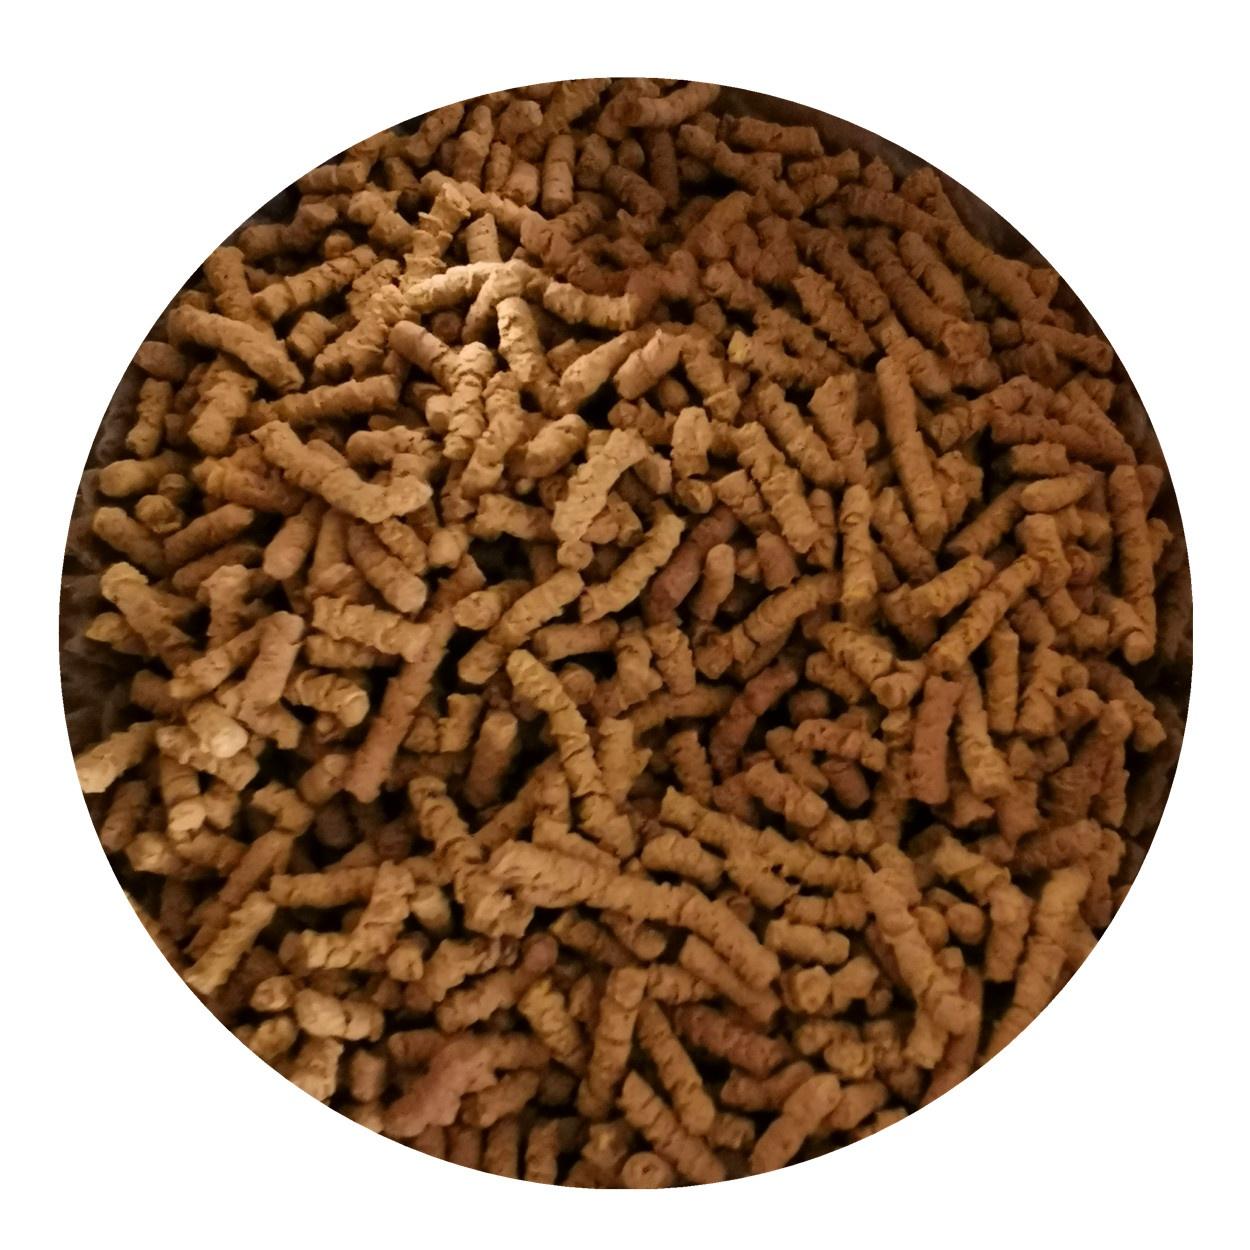 Health Weight Control Black Buckwheat Herb Tea Wholegrain Organic Roasted Soba Buckwheat Tea Korean Tartary Buckwheat Kernel Tea - 4uTea | 4uTea.com